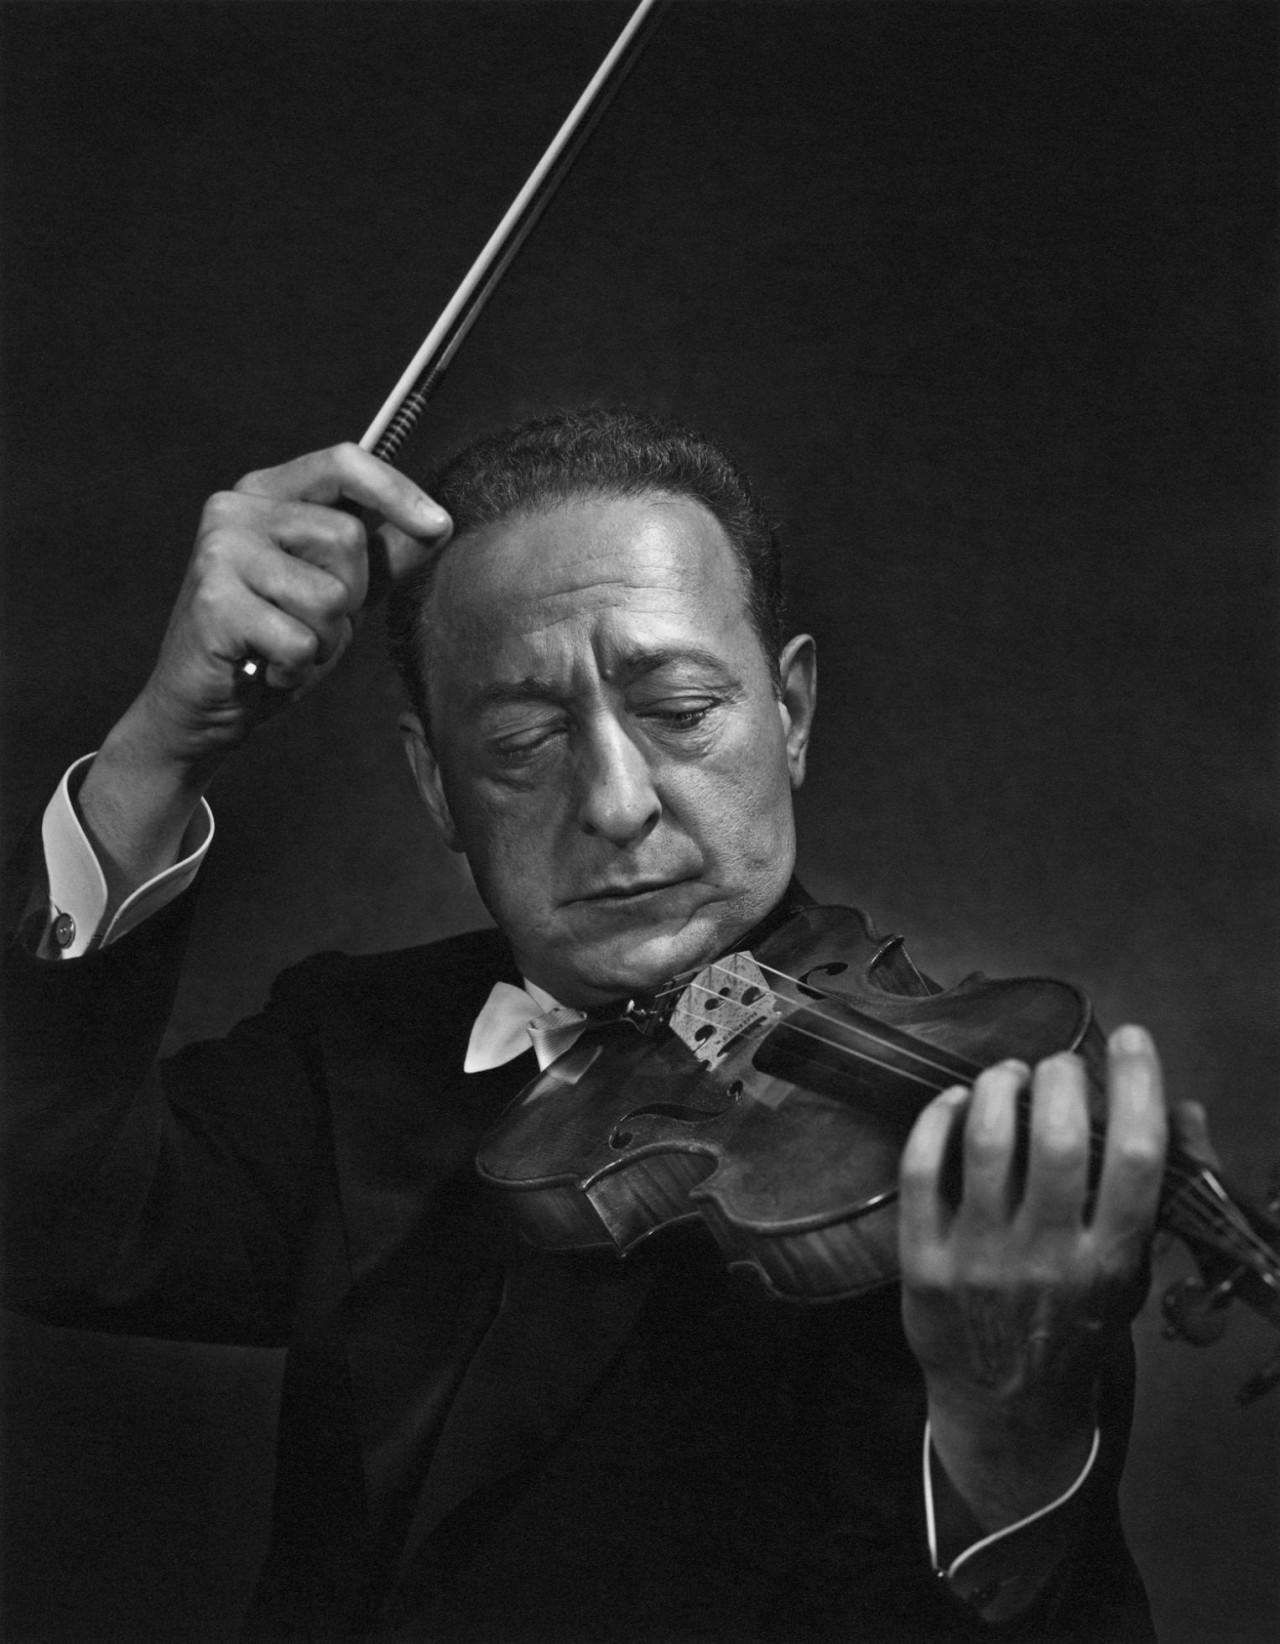 Яша Хейфец, 1950. Автор Юсуф Карш